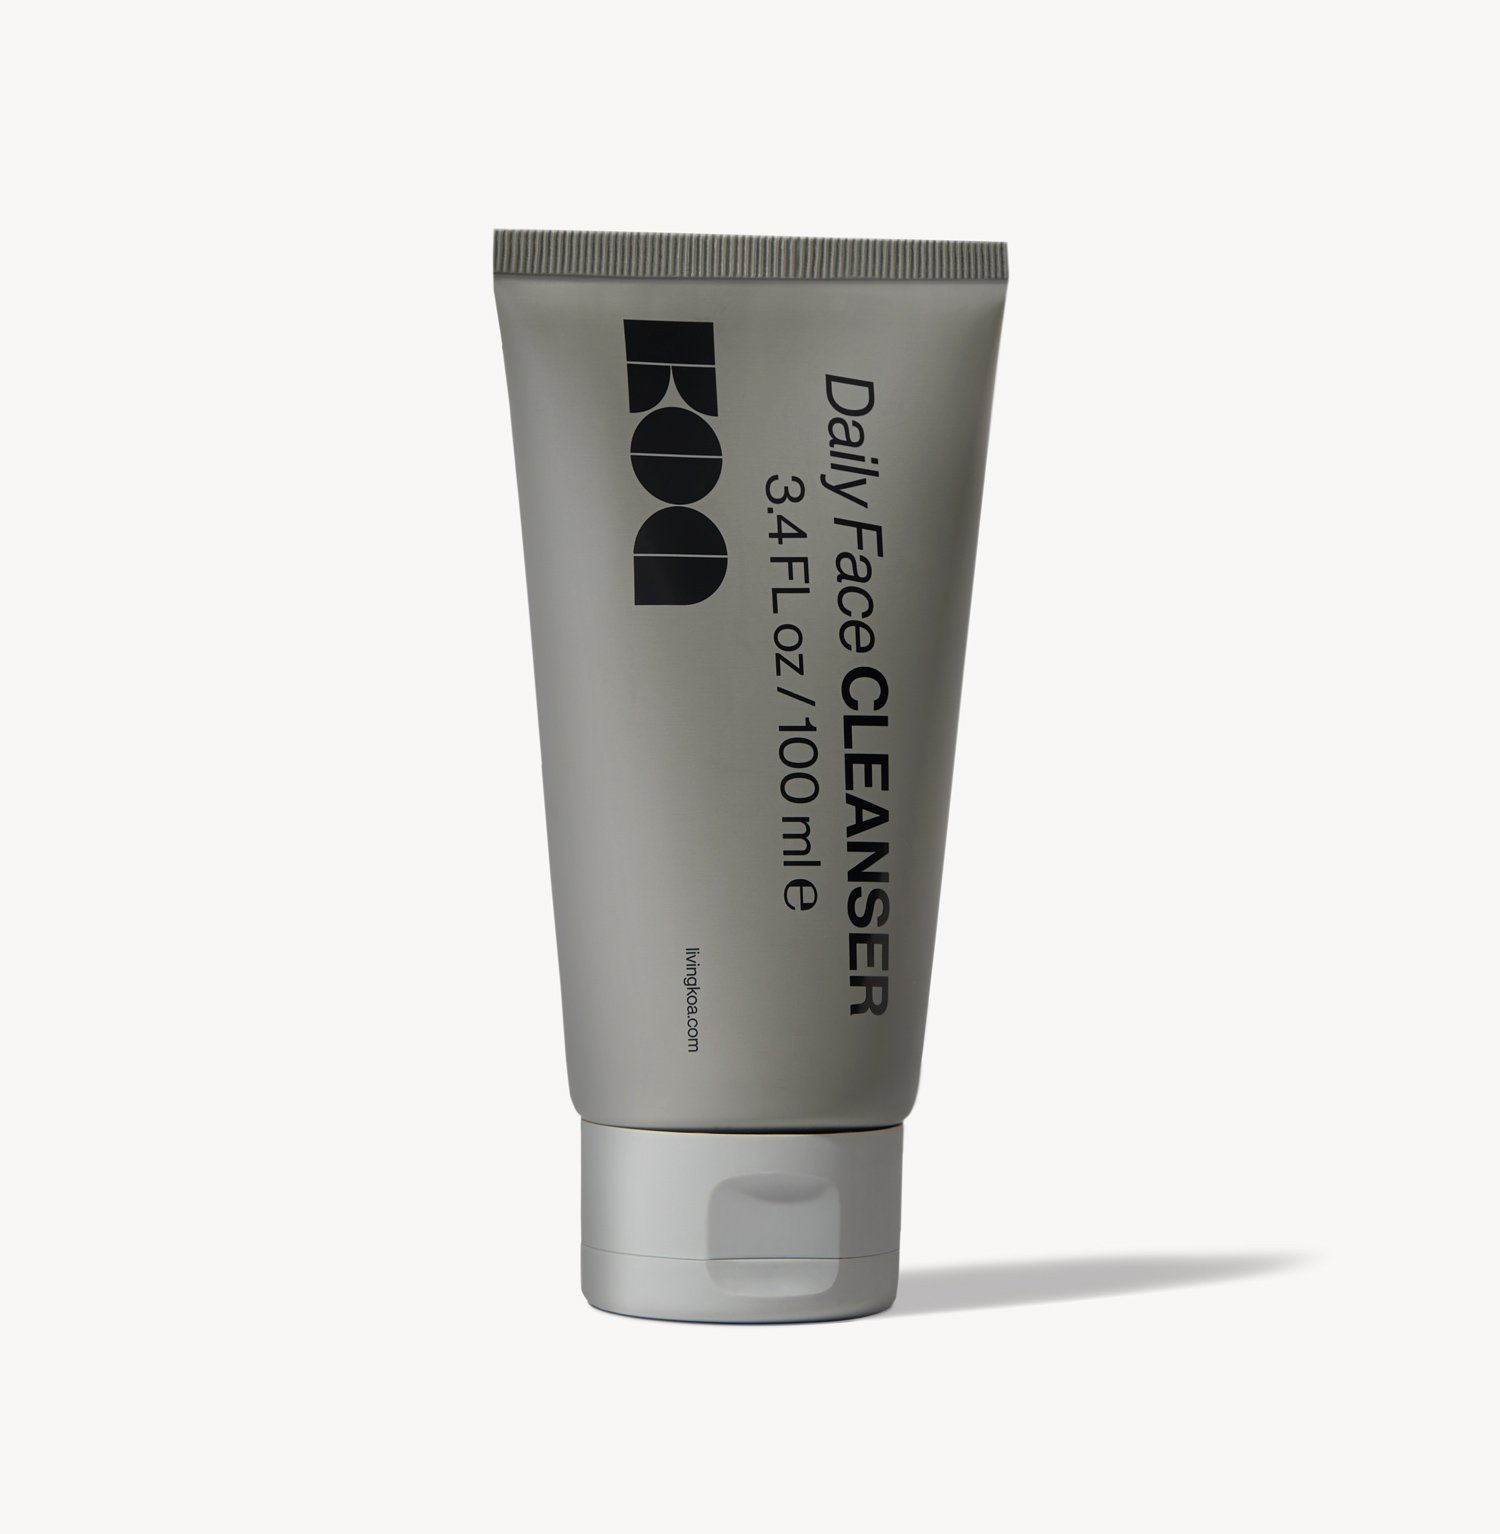 Koa Daily Face Cleanser